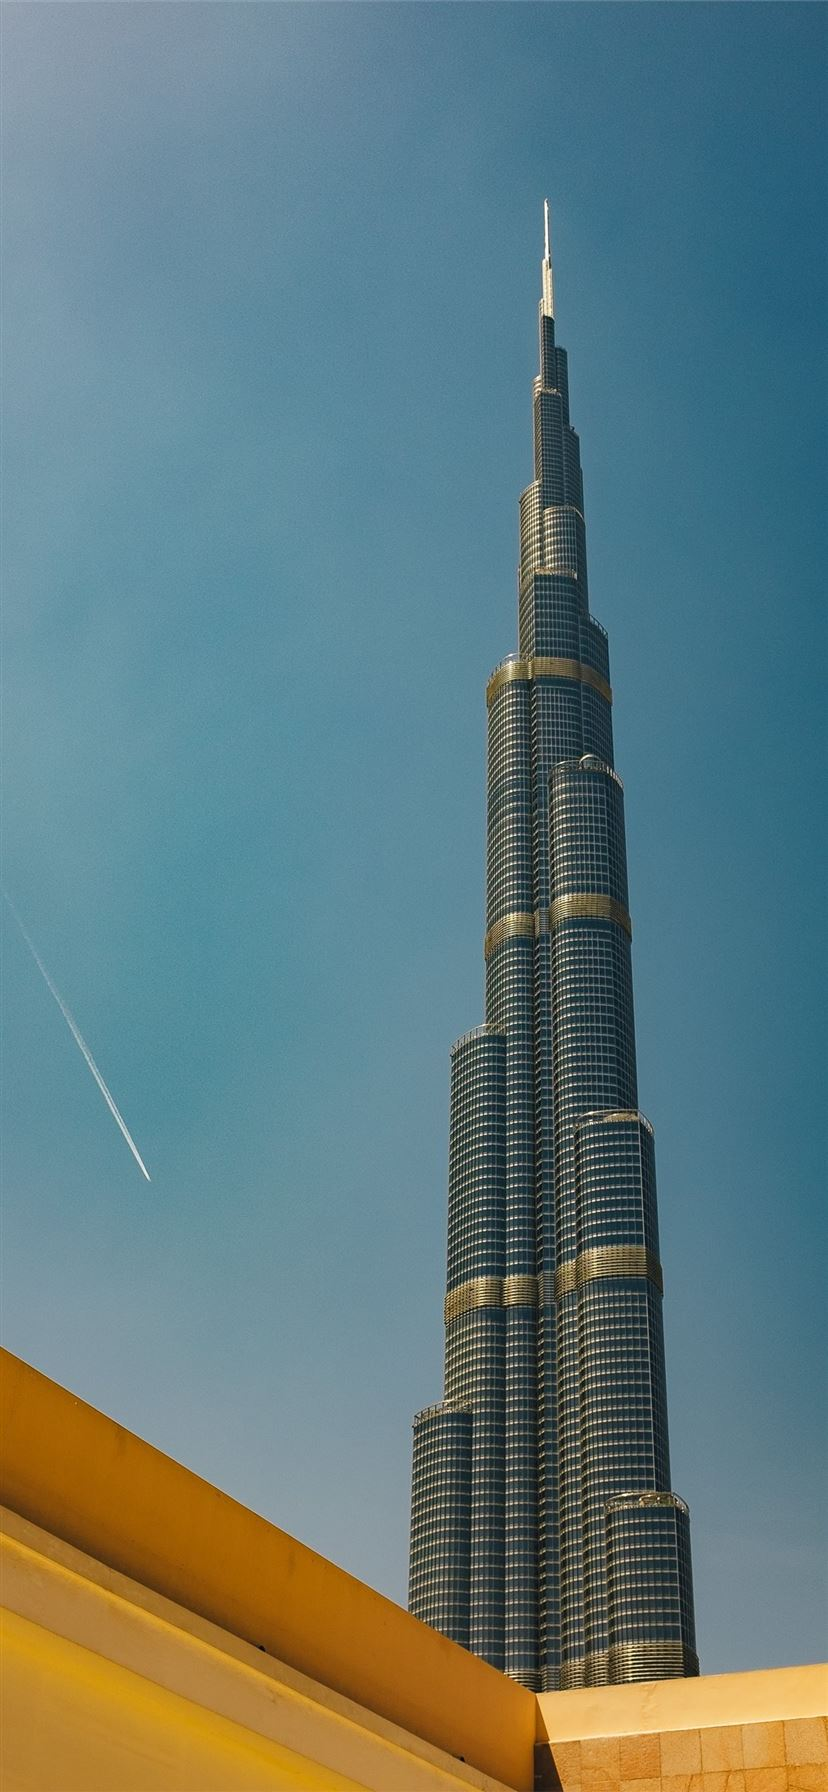 Burj Khalifa Dubai Iphone 11 Wallpapers Free Download